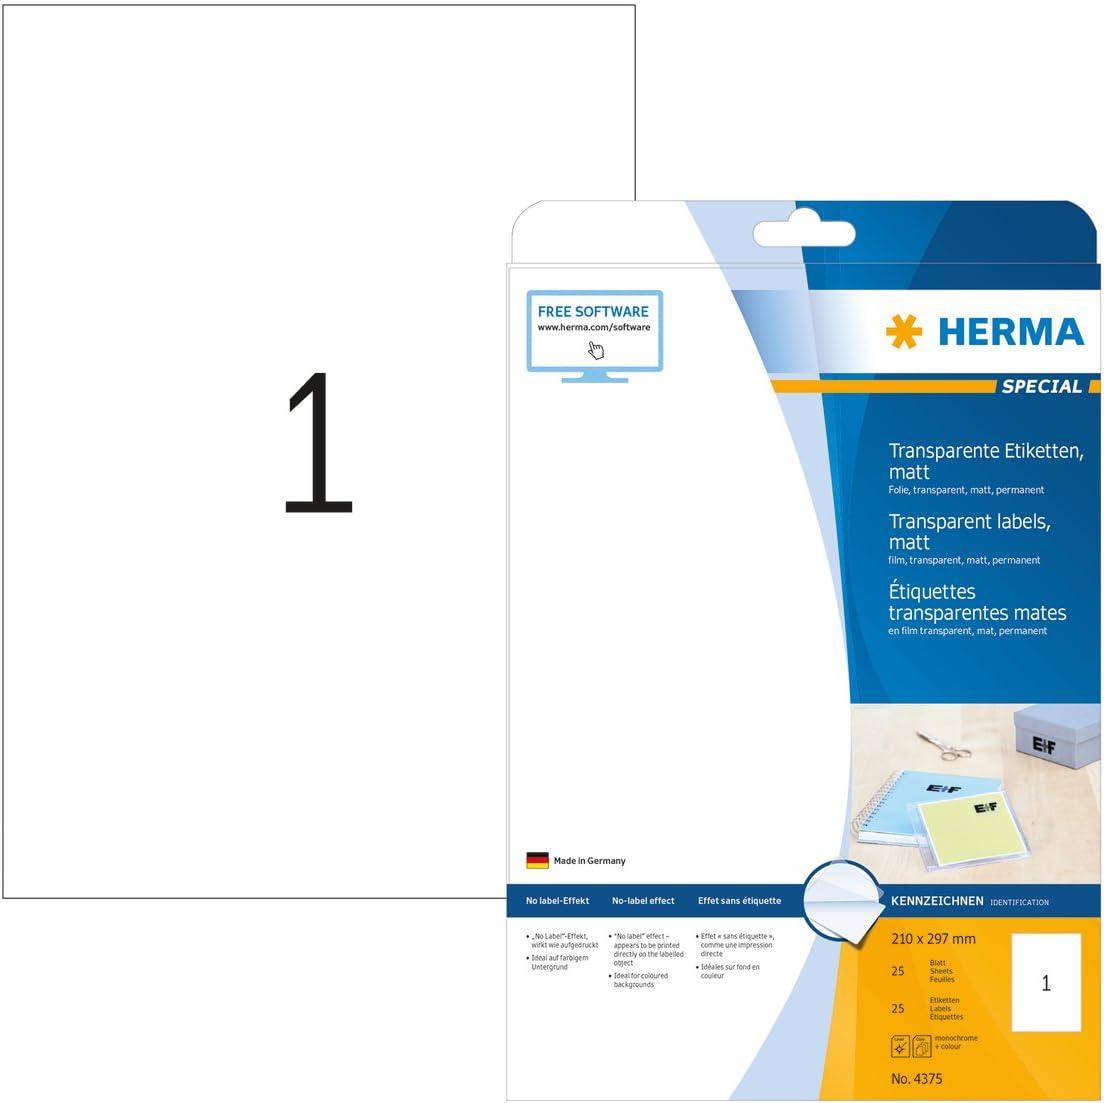 bedruckbar 48,3 x 25,4 mm, 25 Blatt, Polyesterfolie, matt selbstklebend HERMA 4680 Wetterfeste Folien-Etiketten DIN A4 transparent 1.100 Klebeetiketten durchsichtig permanent haftende Klebefolie